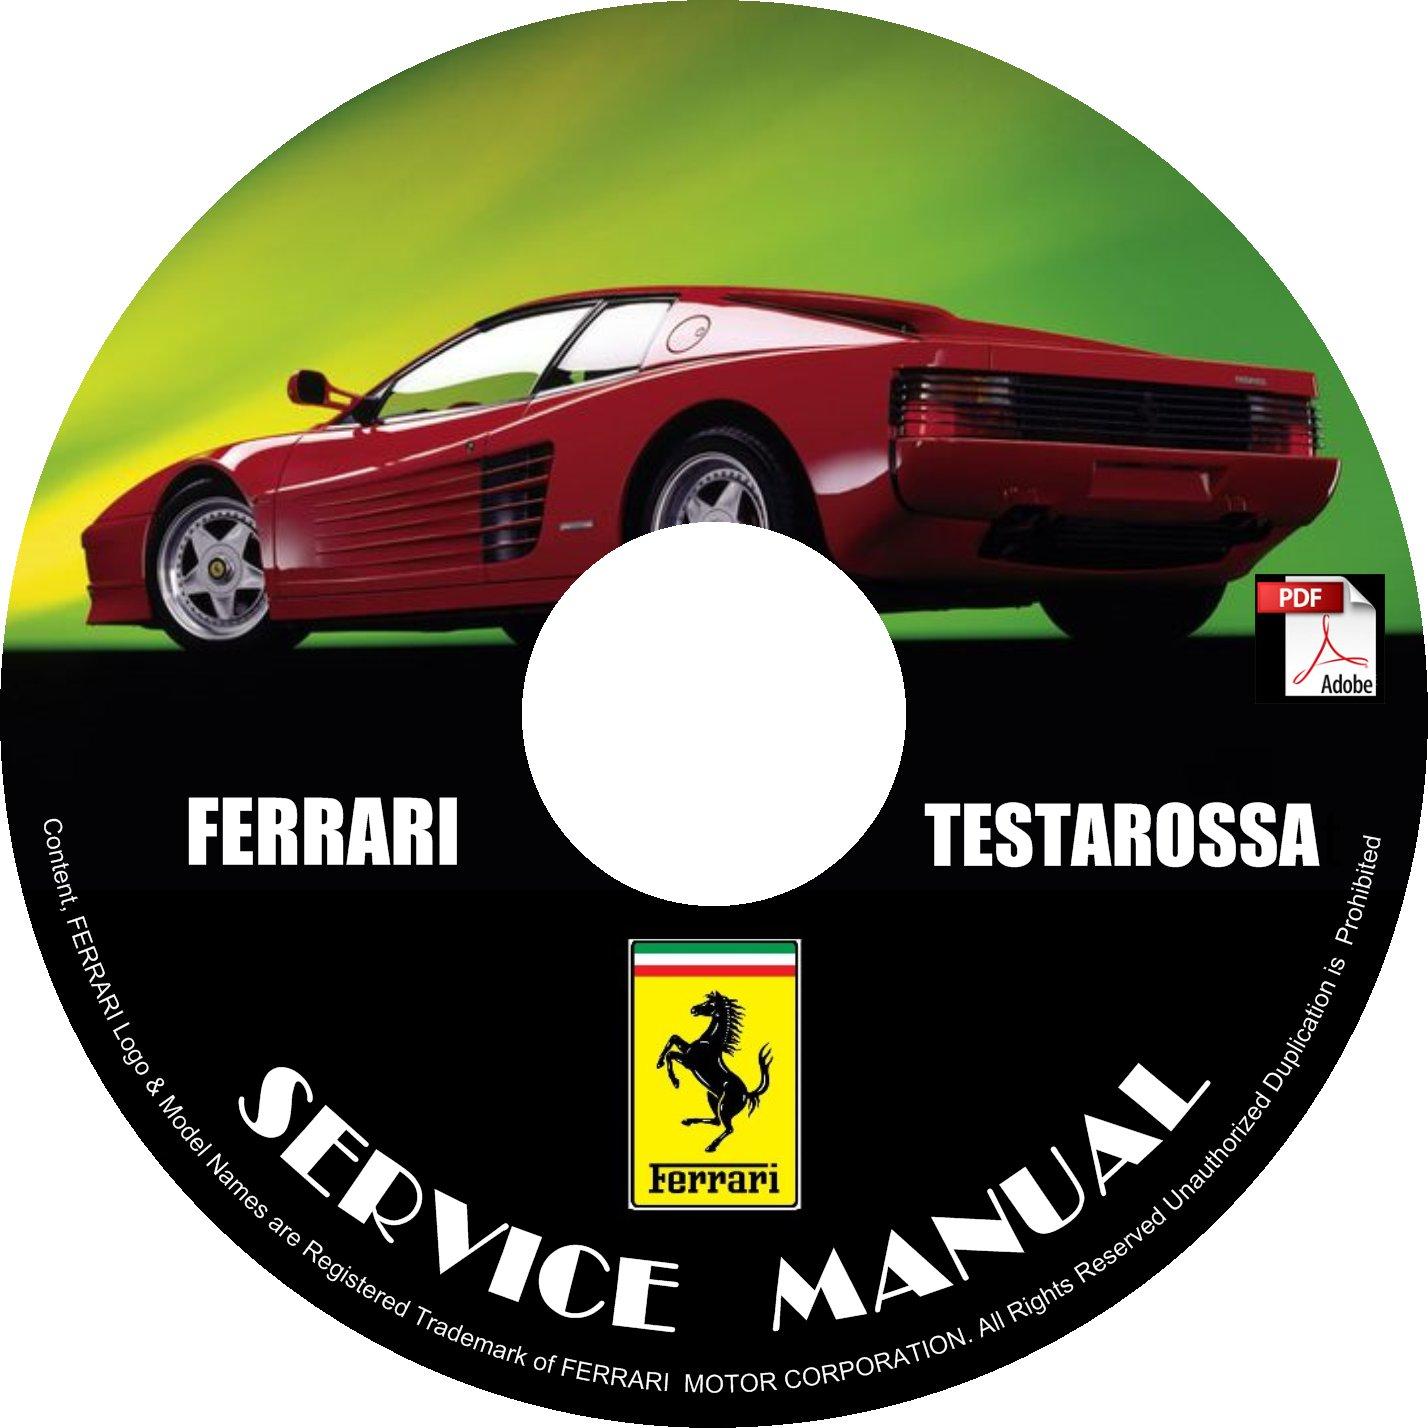 1984 Ferrari Testarossa Factory Service Repair Shop Manual on CD Fix Rebuilt